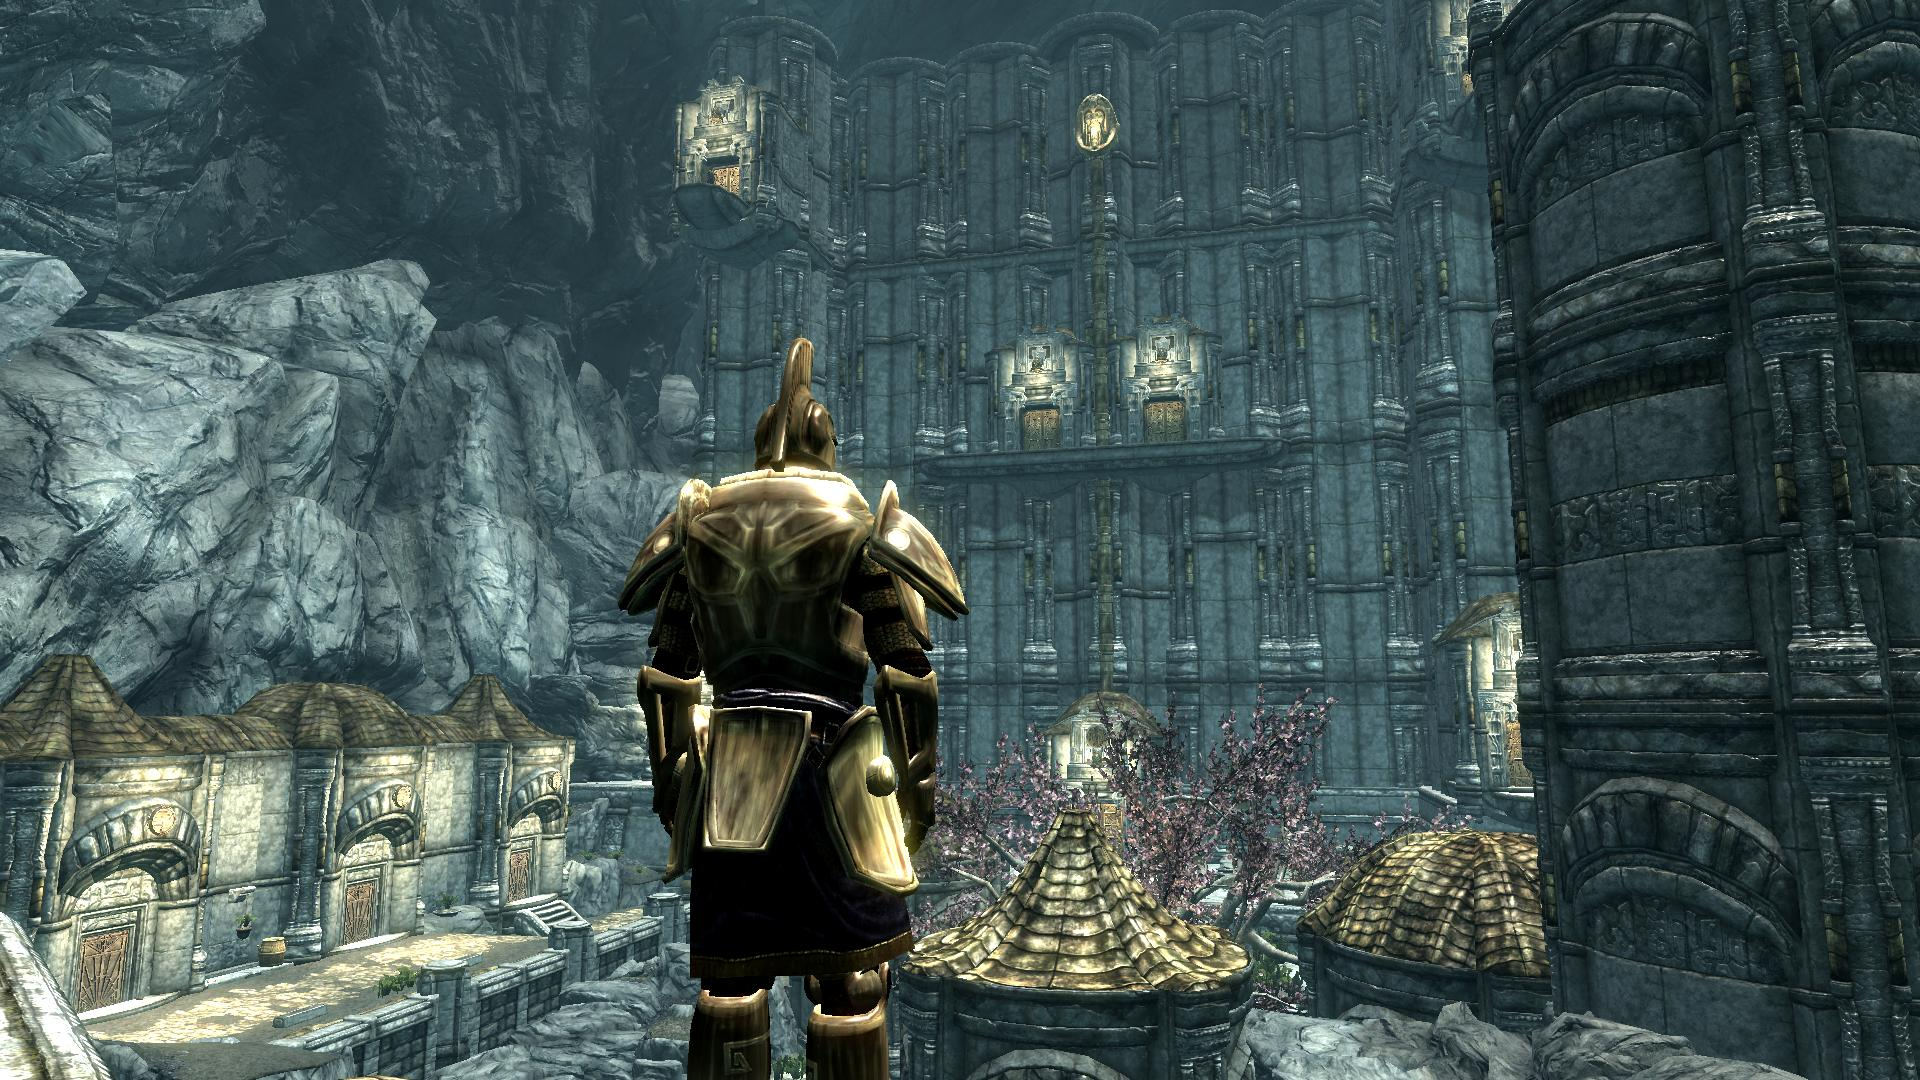 the best skyrim mods: the forgotten city